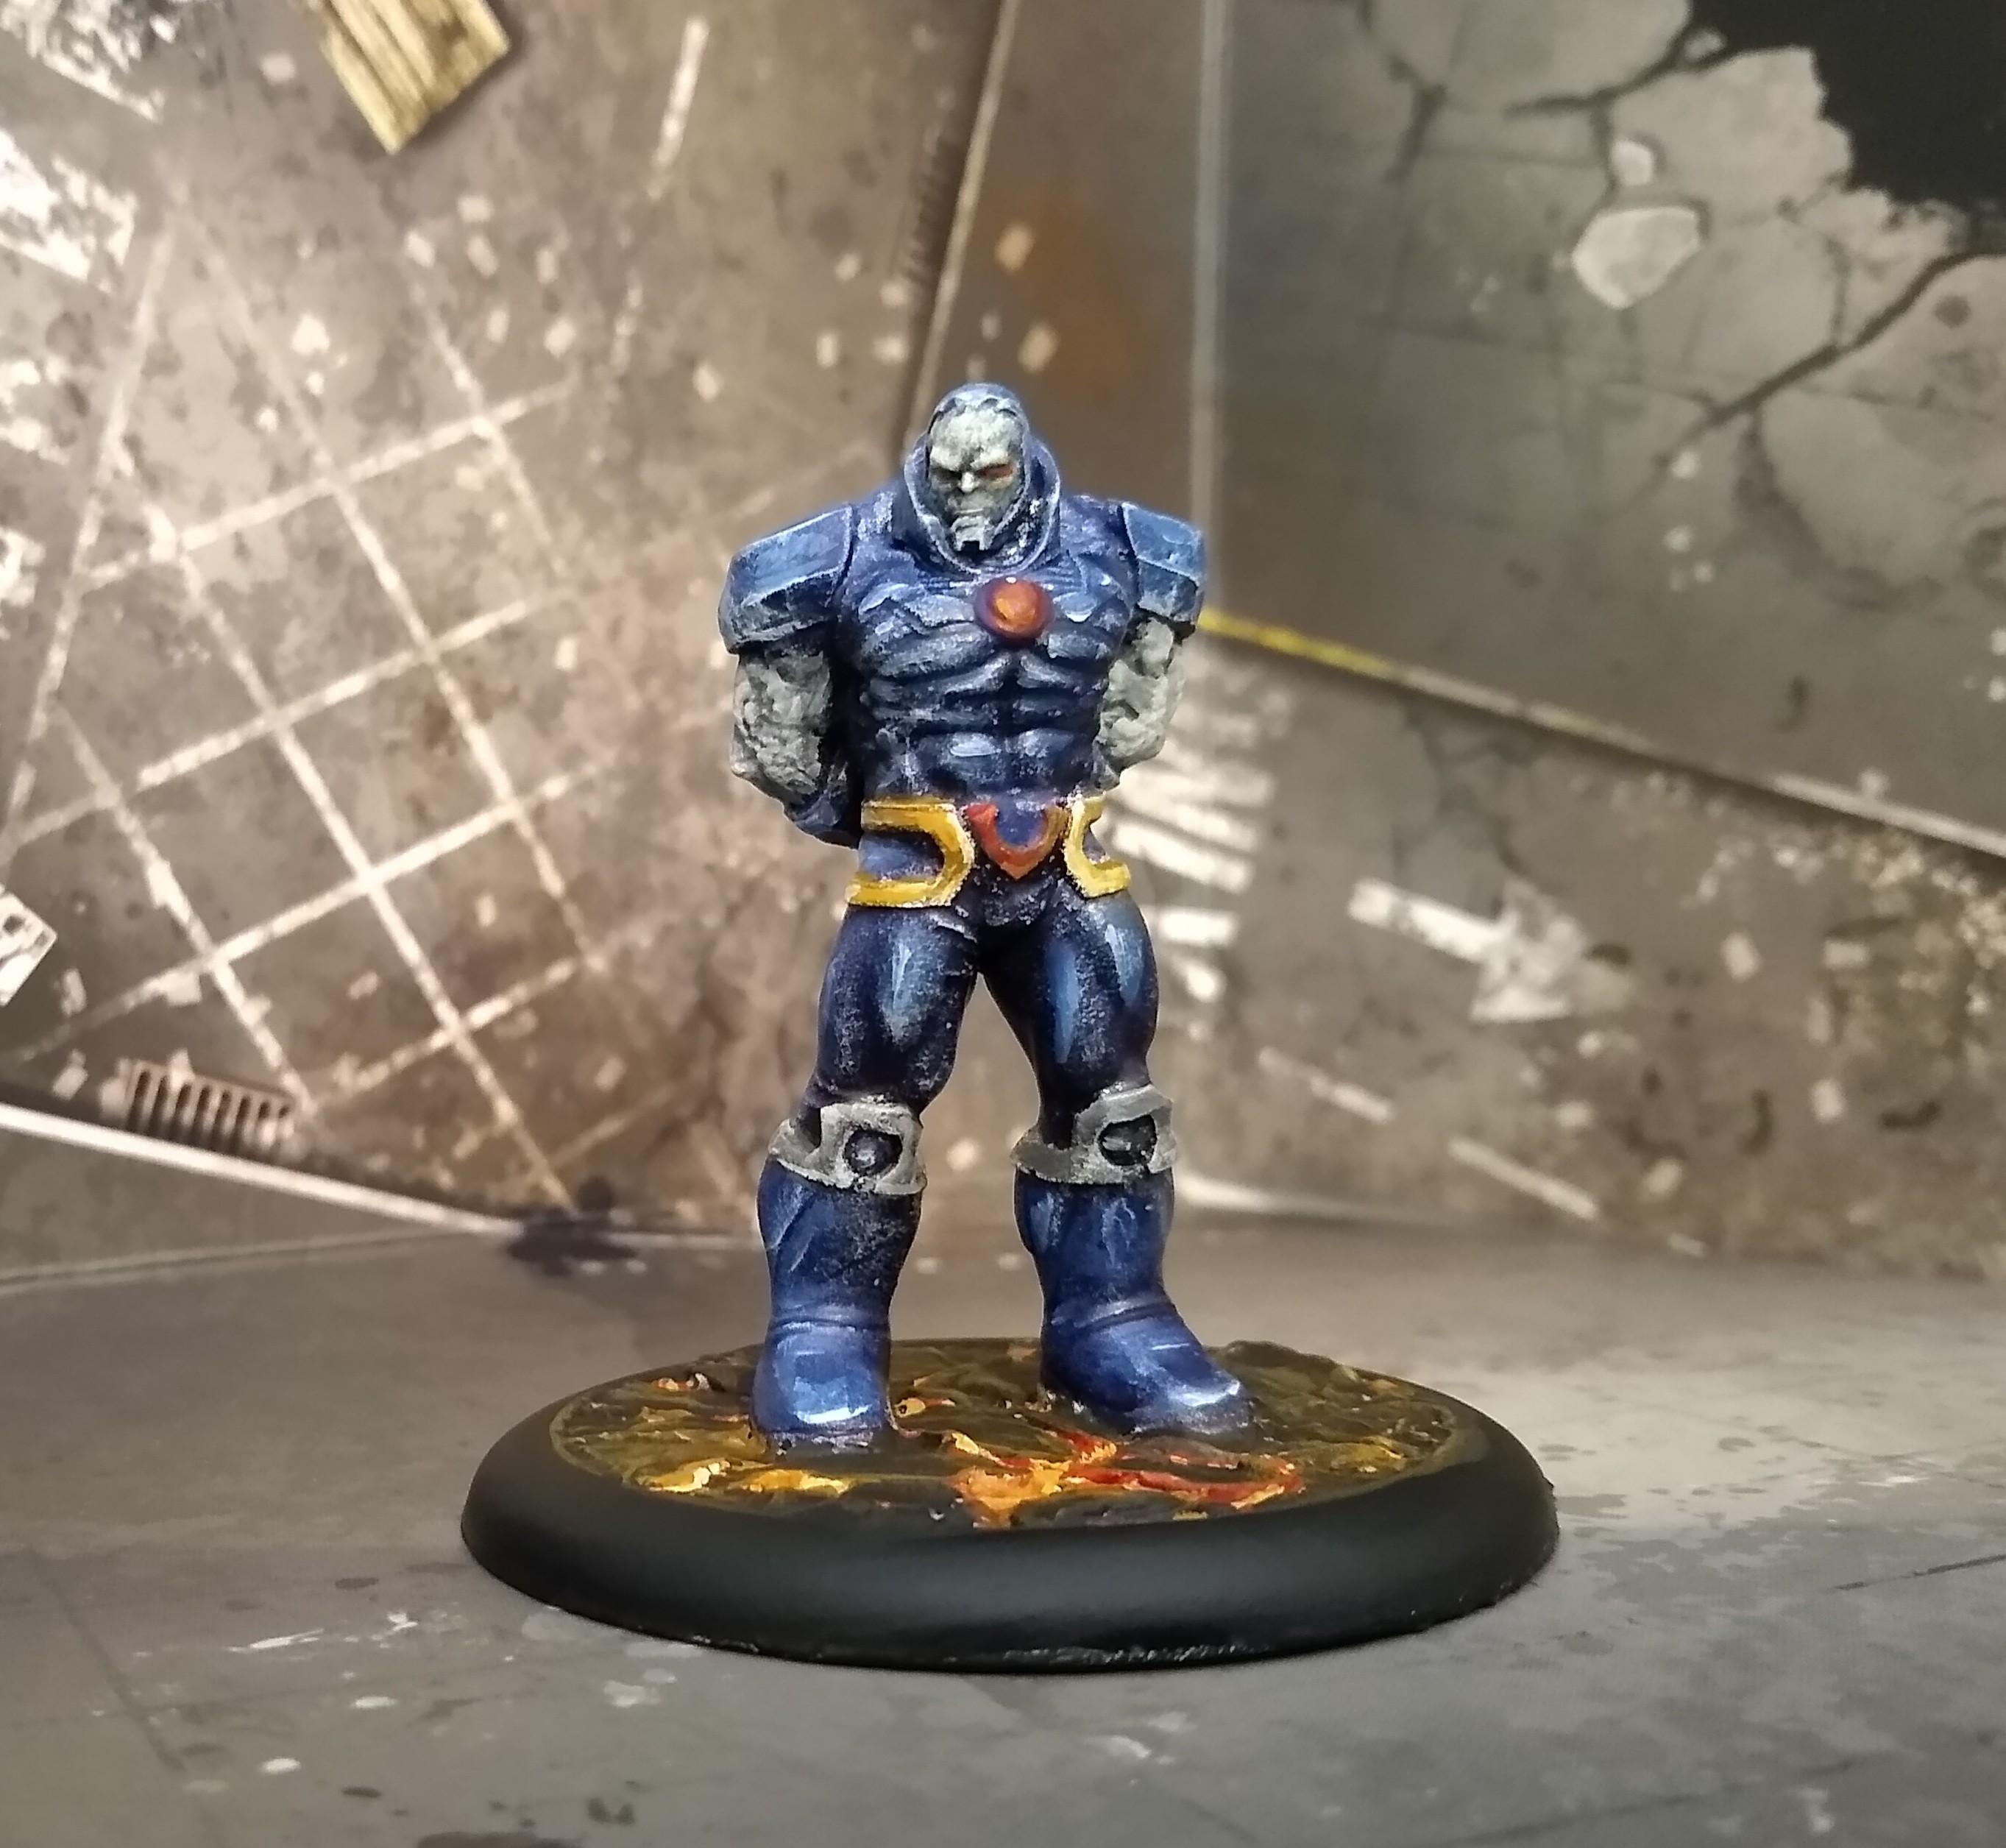 Darkseid IS